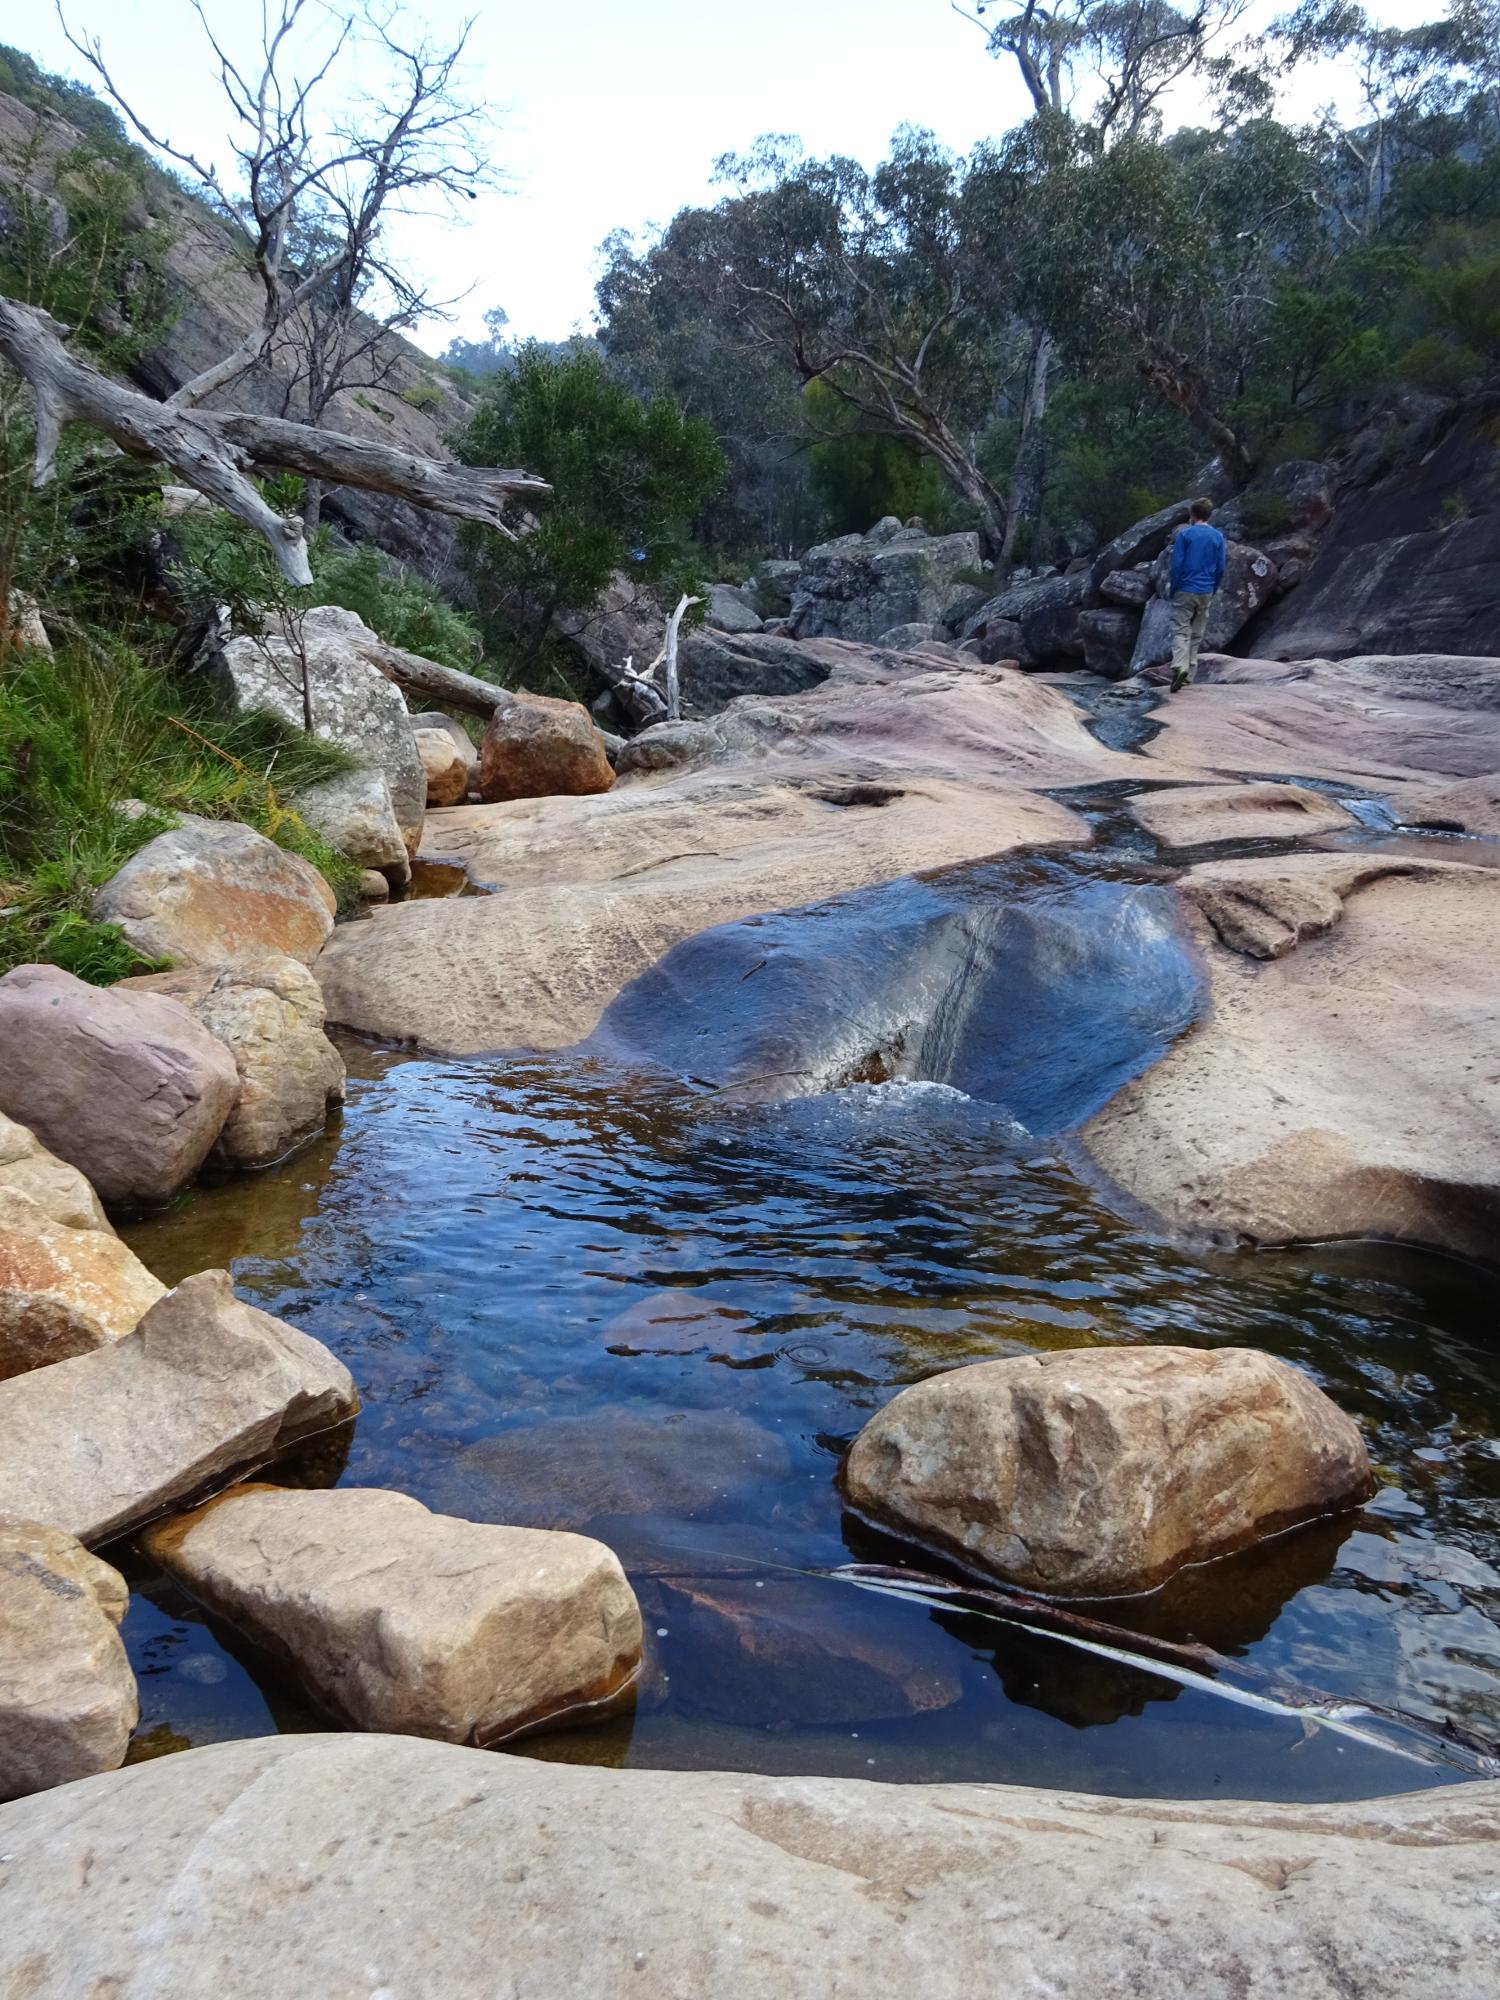 Venus baths rock slides in the Grampians